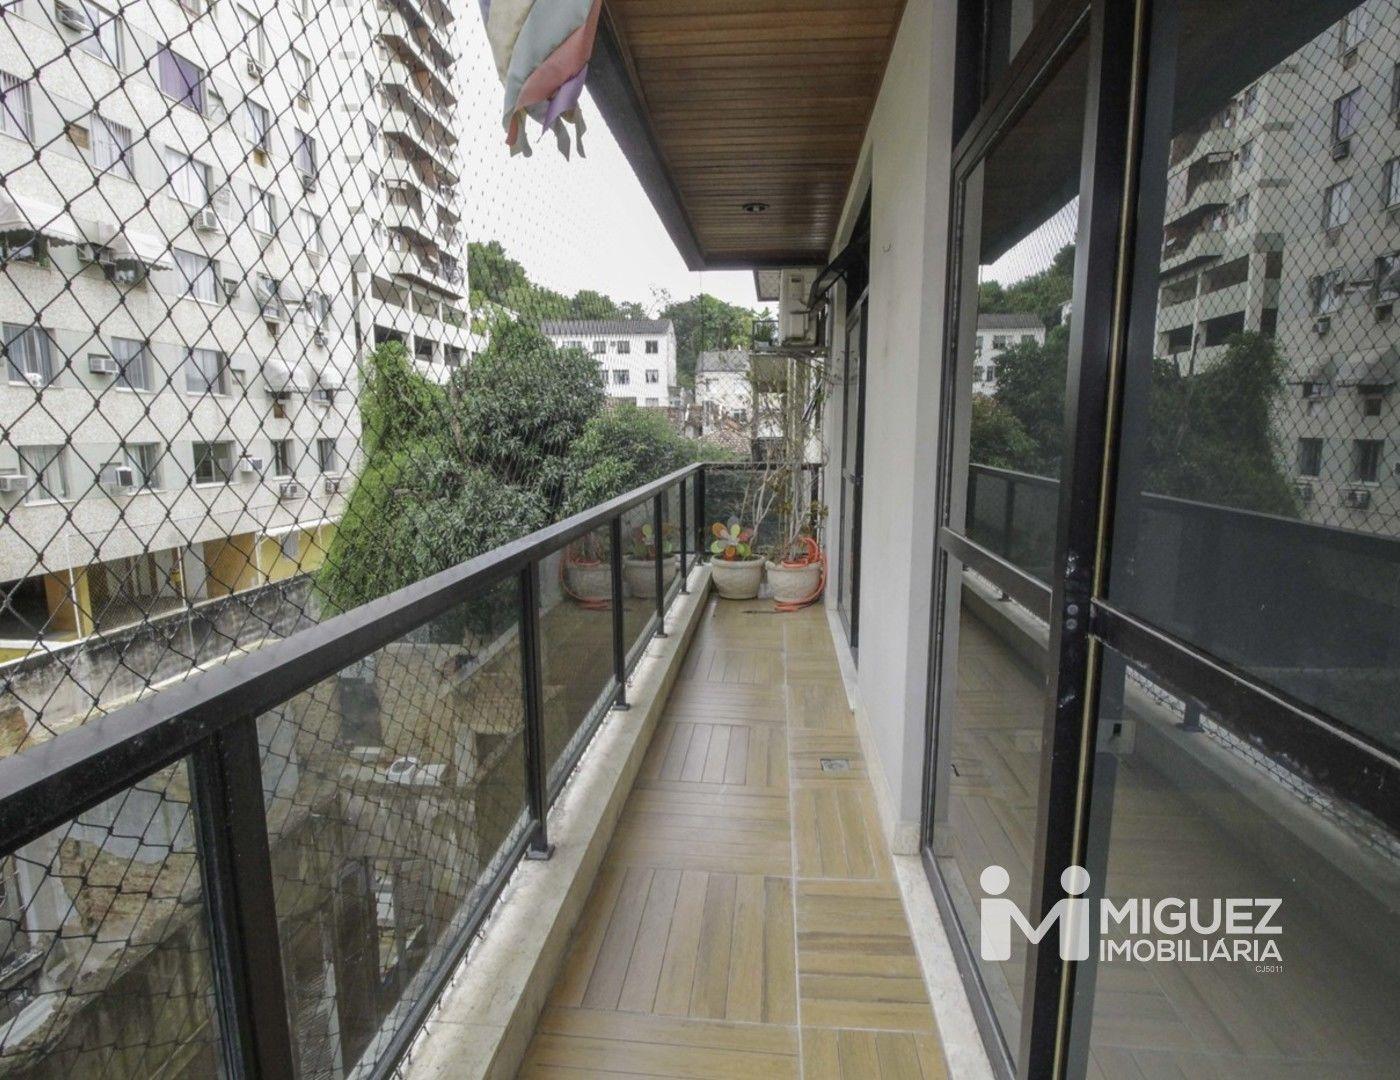 Apartamento, aluguel, Rua Valparaiso - Tijuca , Rio de janeiro